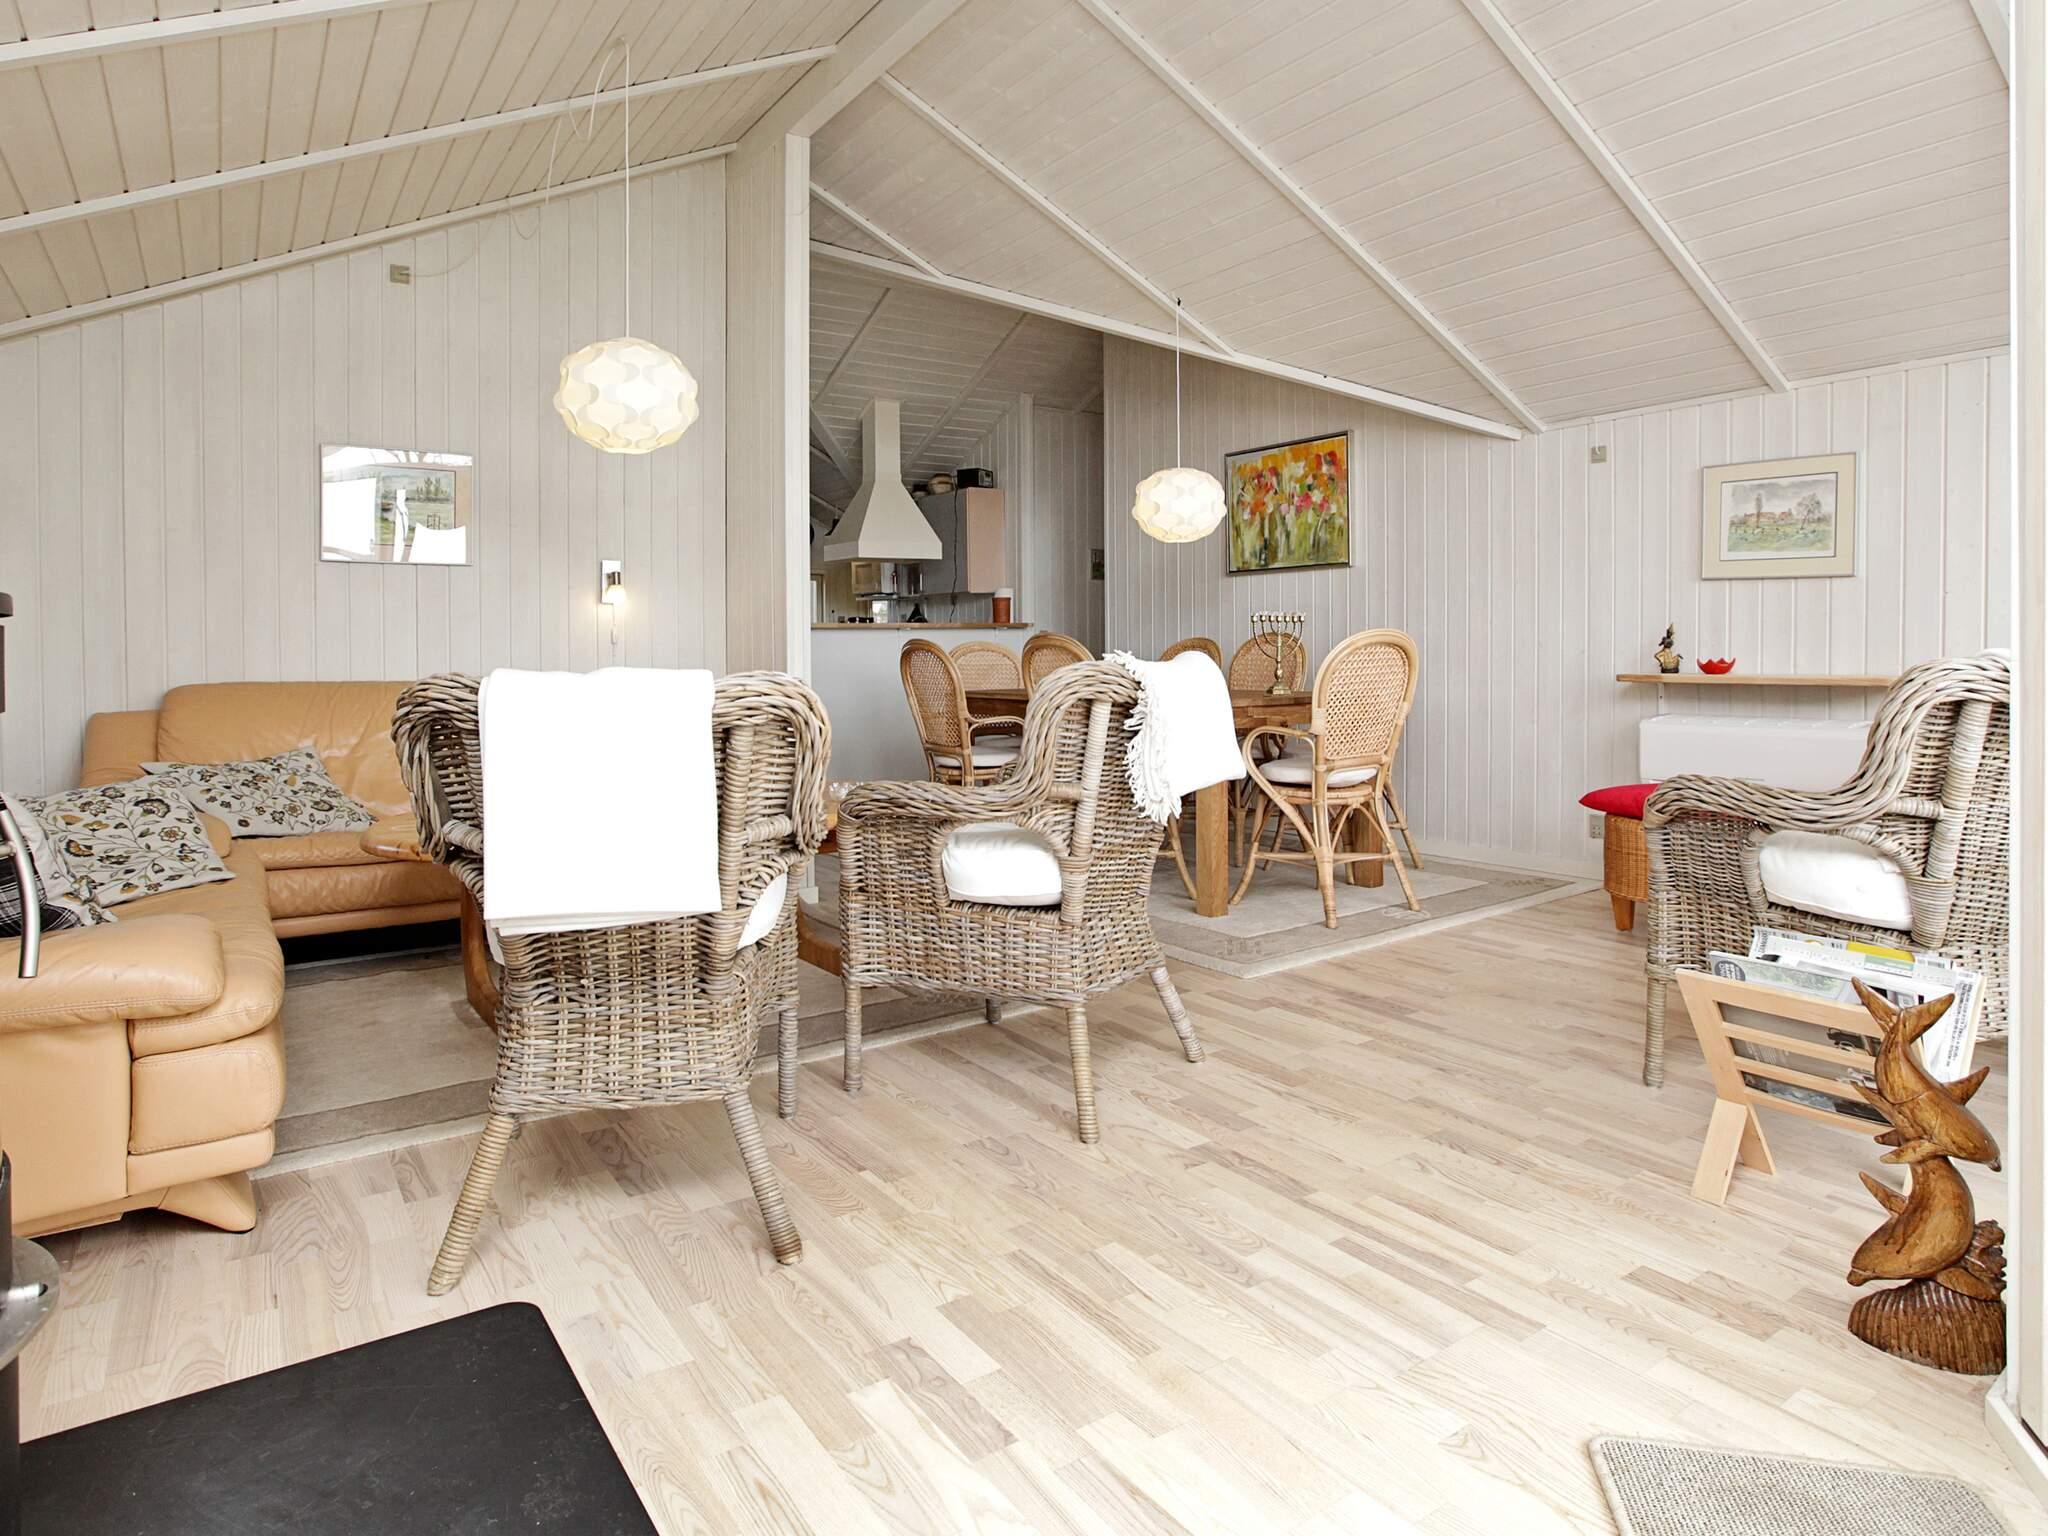 Ferienhaus Råbylille Strand (87316), Råbylille, , Møn, Dänemark, Bild 3